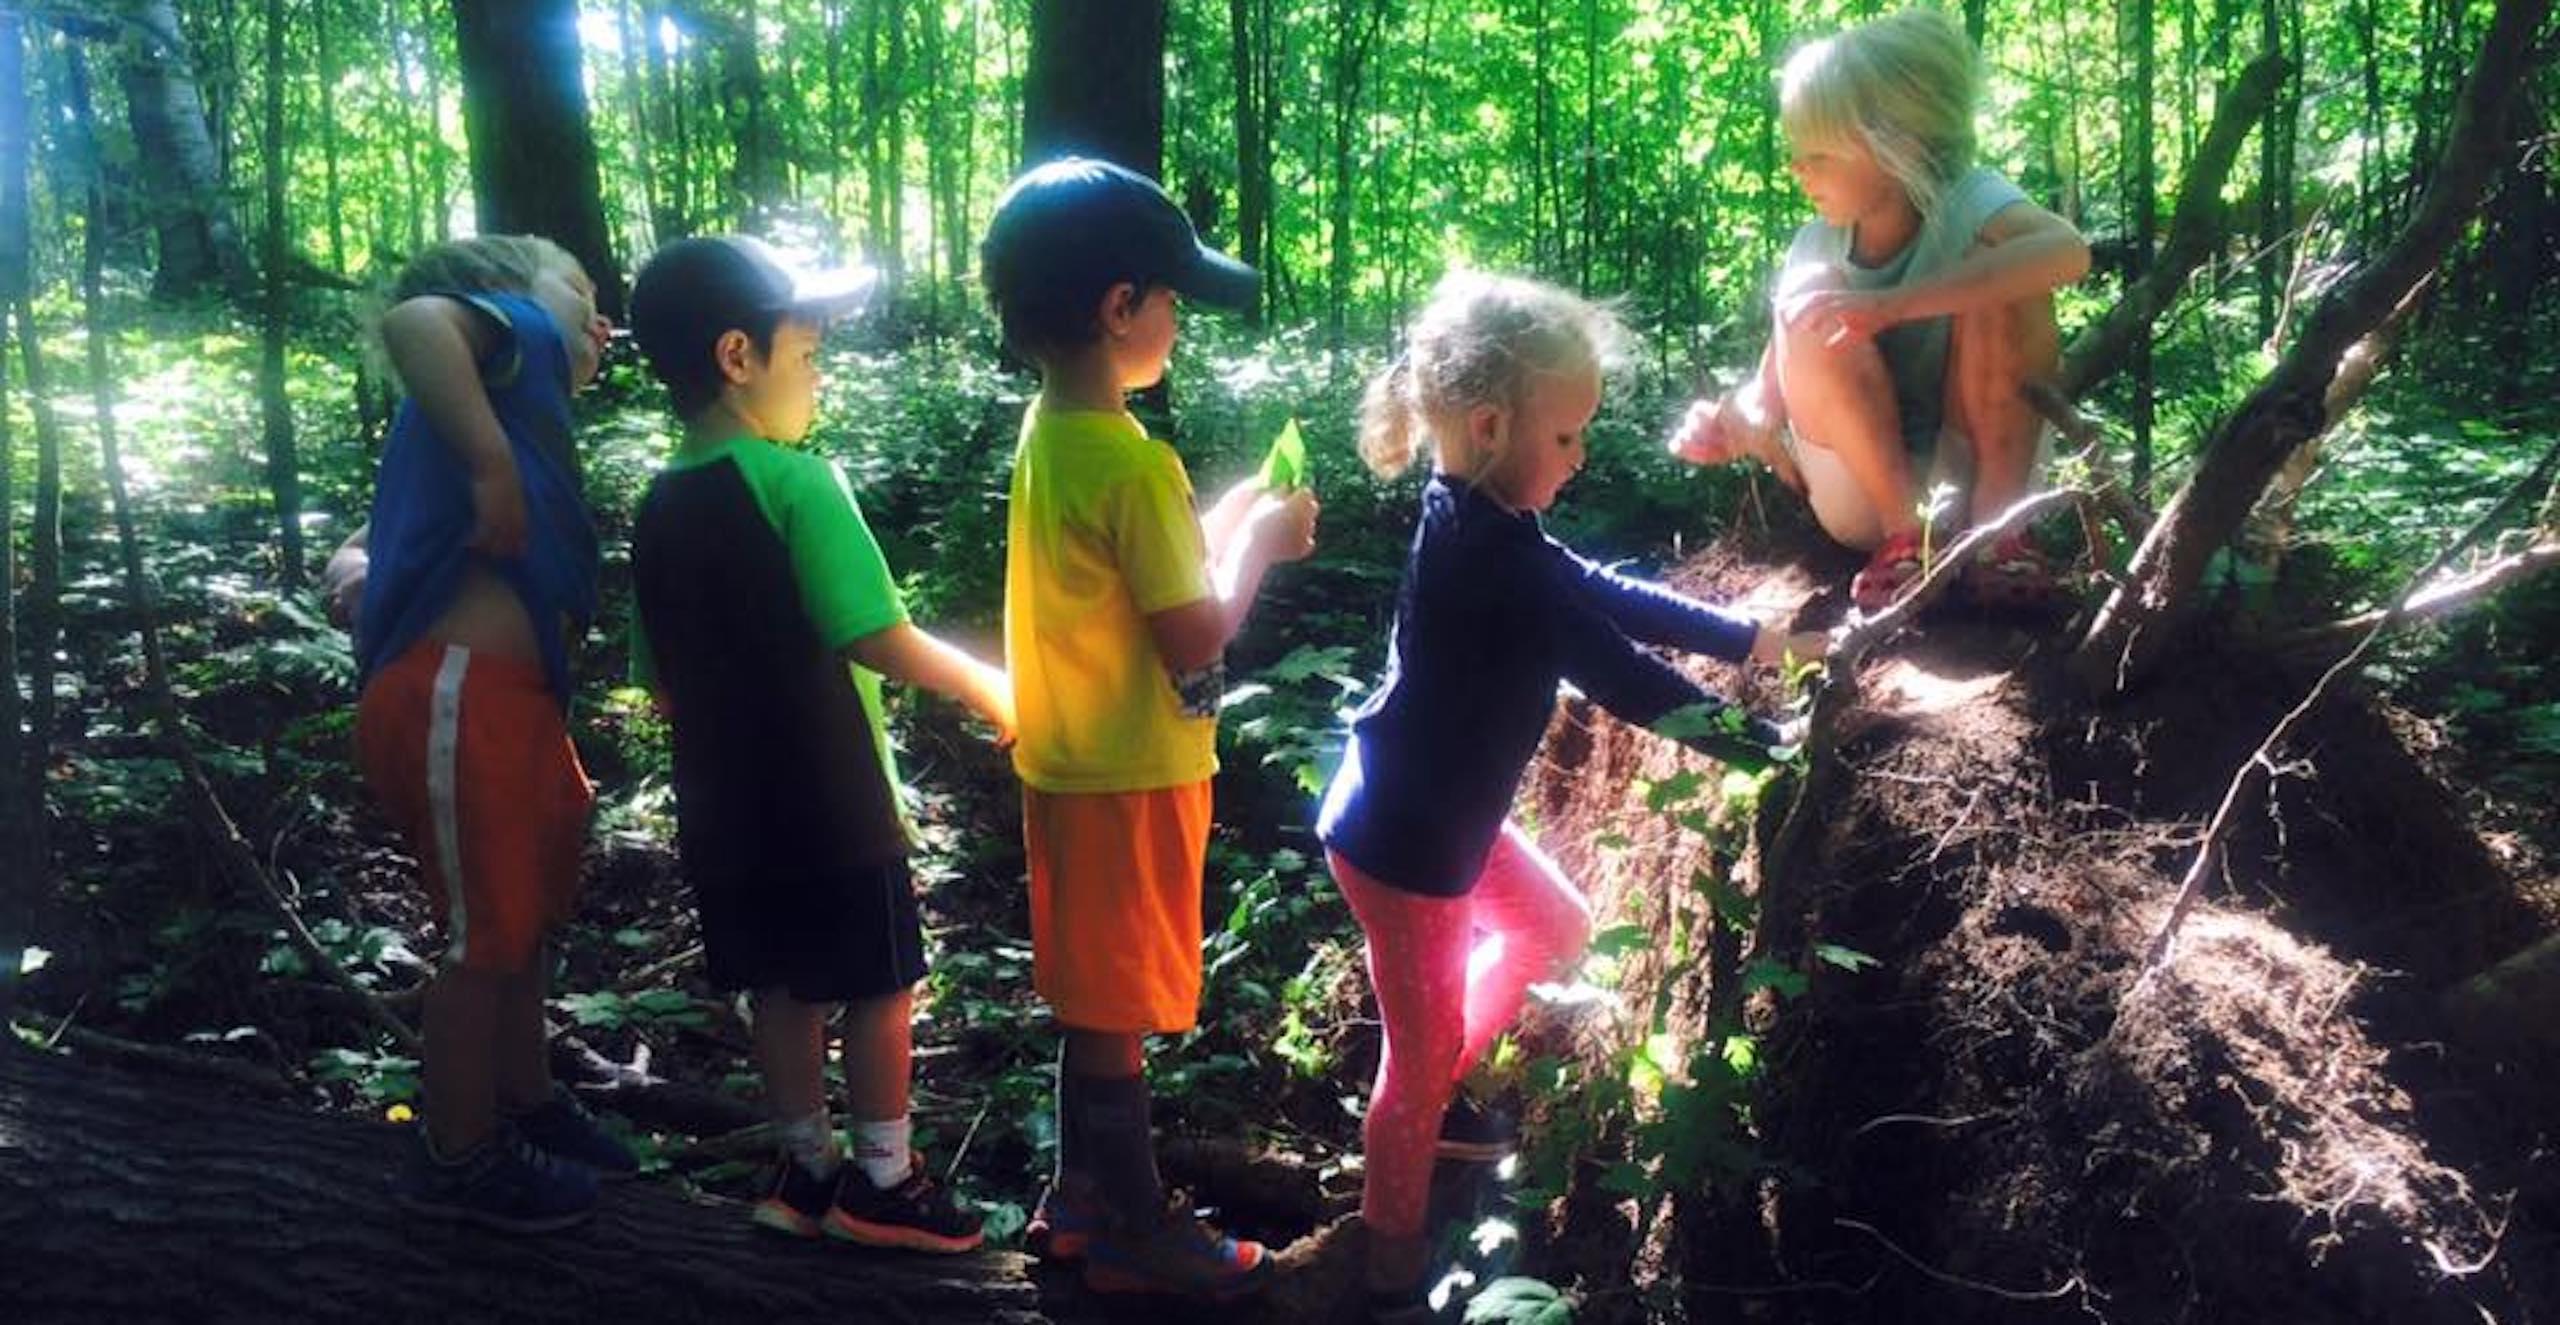 Children investigate fallen logs,